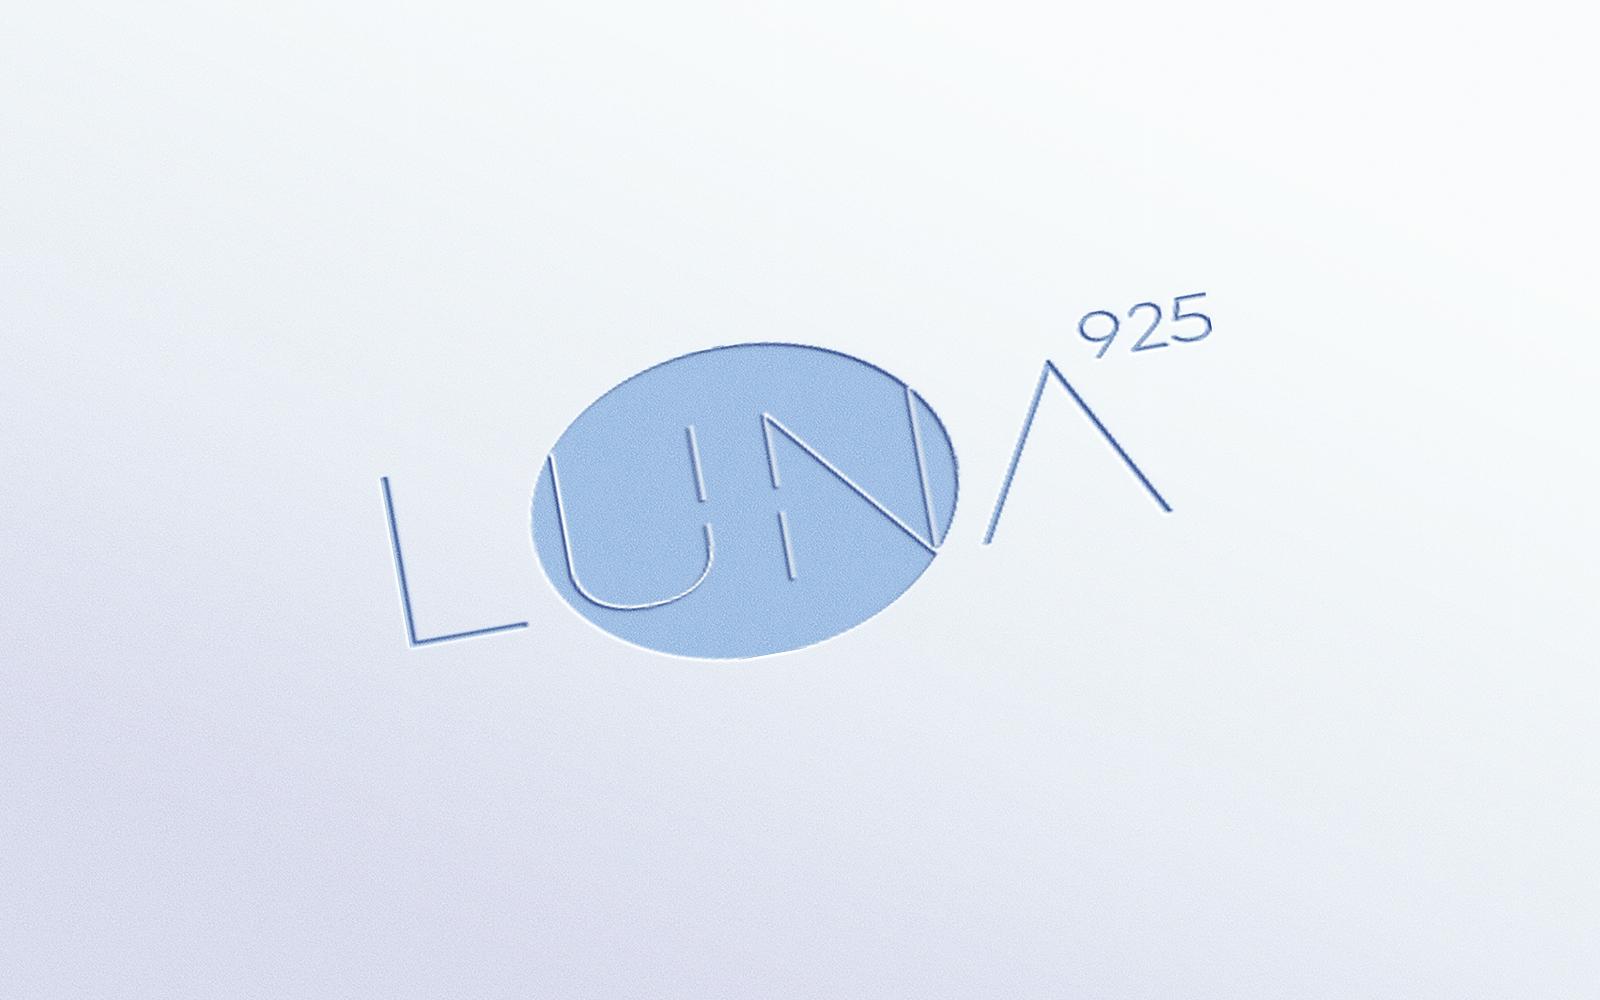 Логотип для столового серебра и посуды из серебра фото f_6365bae57e2b46e1.jpg